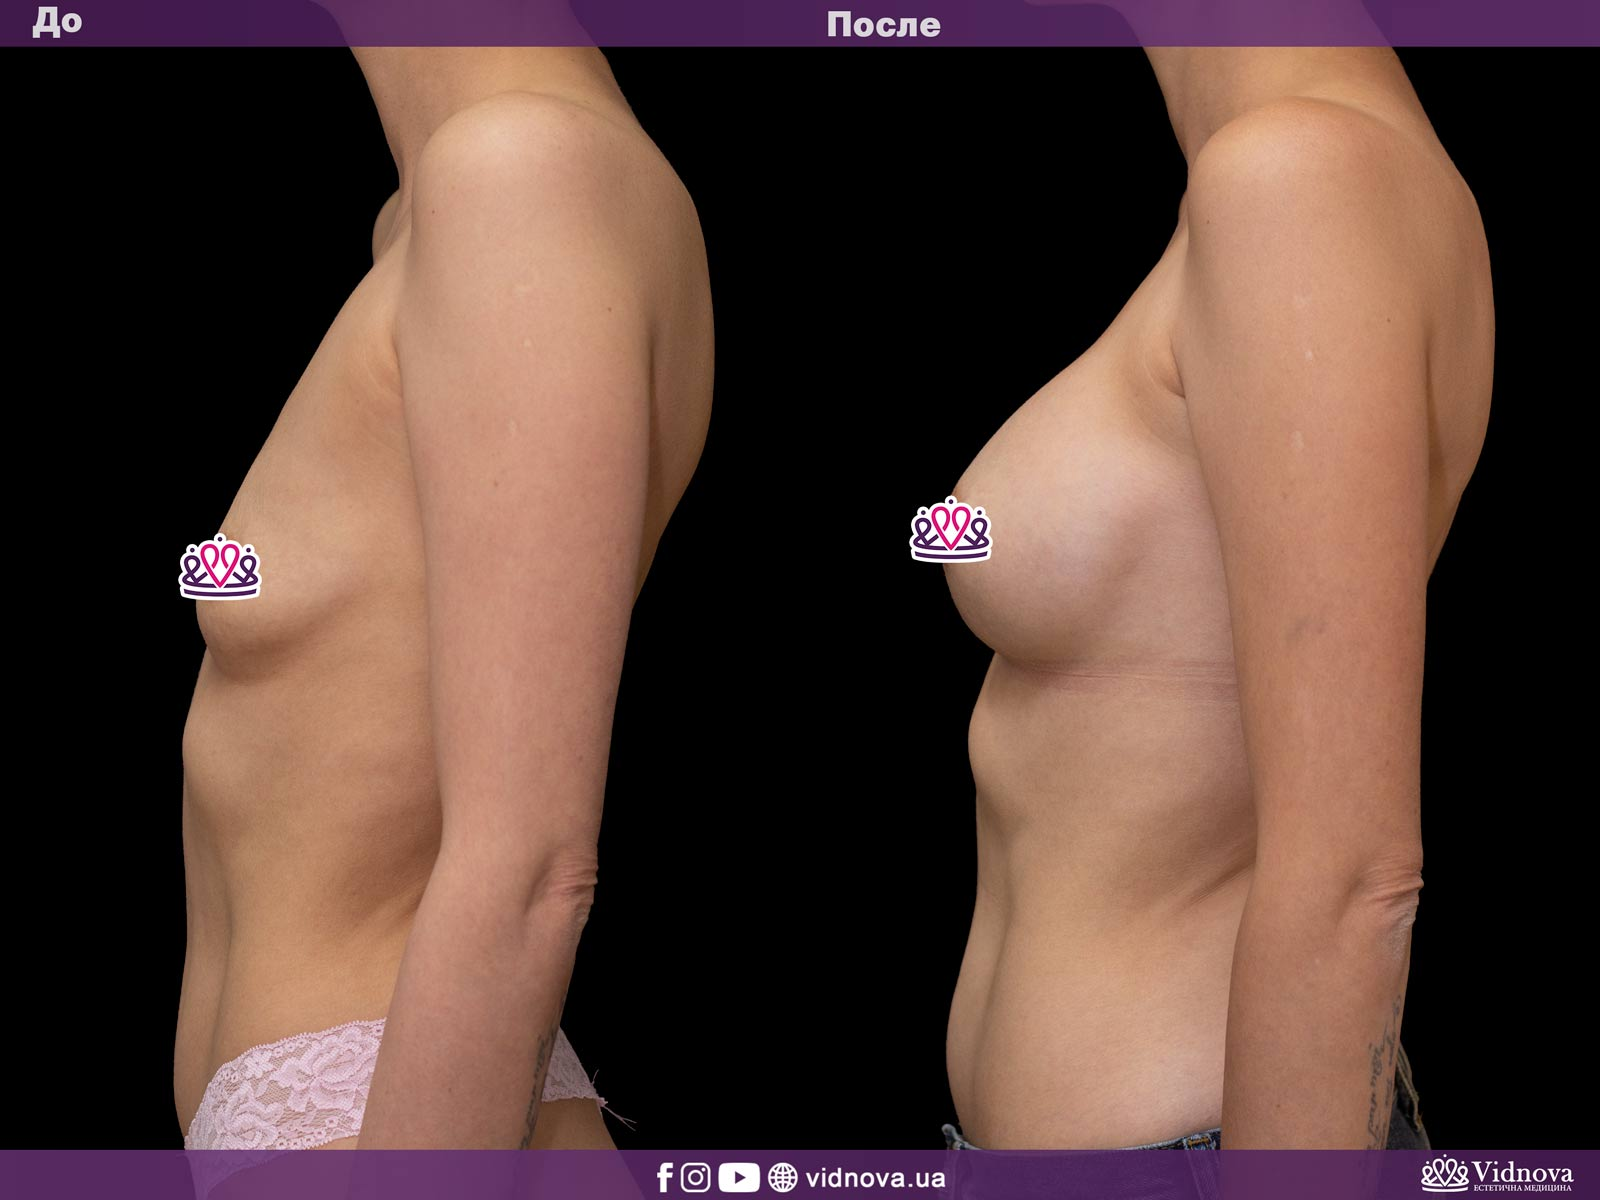 Увеличение груди: Фото ДО и ПОСЛЕ - Пример №25-3 - Клиника Vidnova